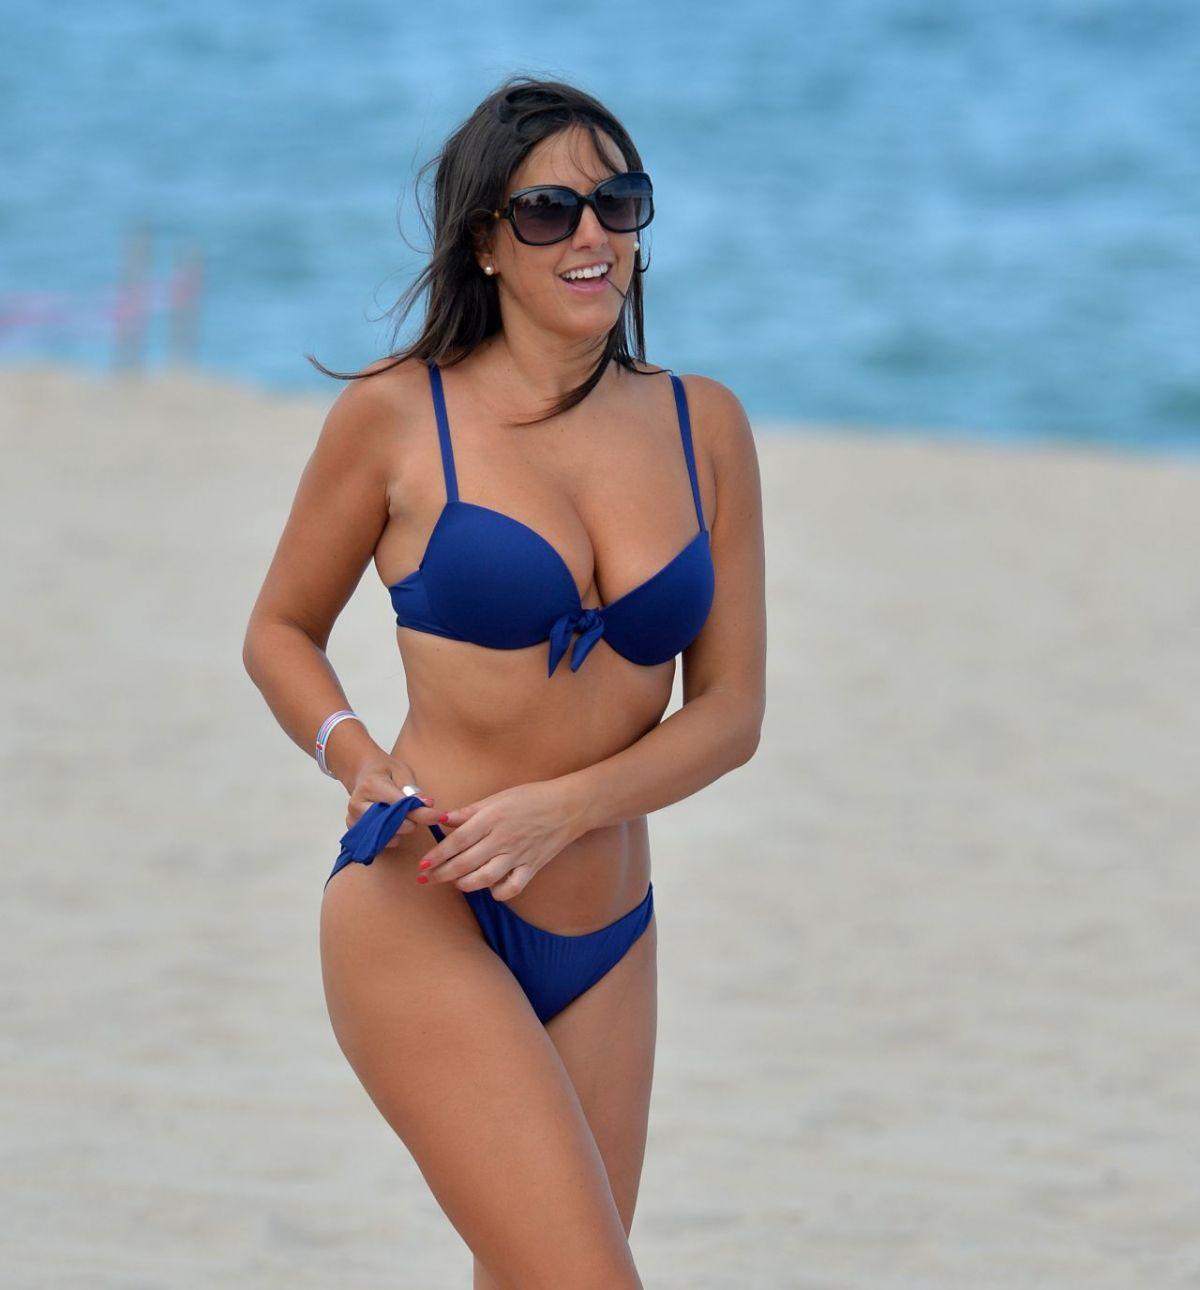 Beach nude boobs-1093